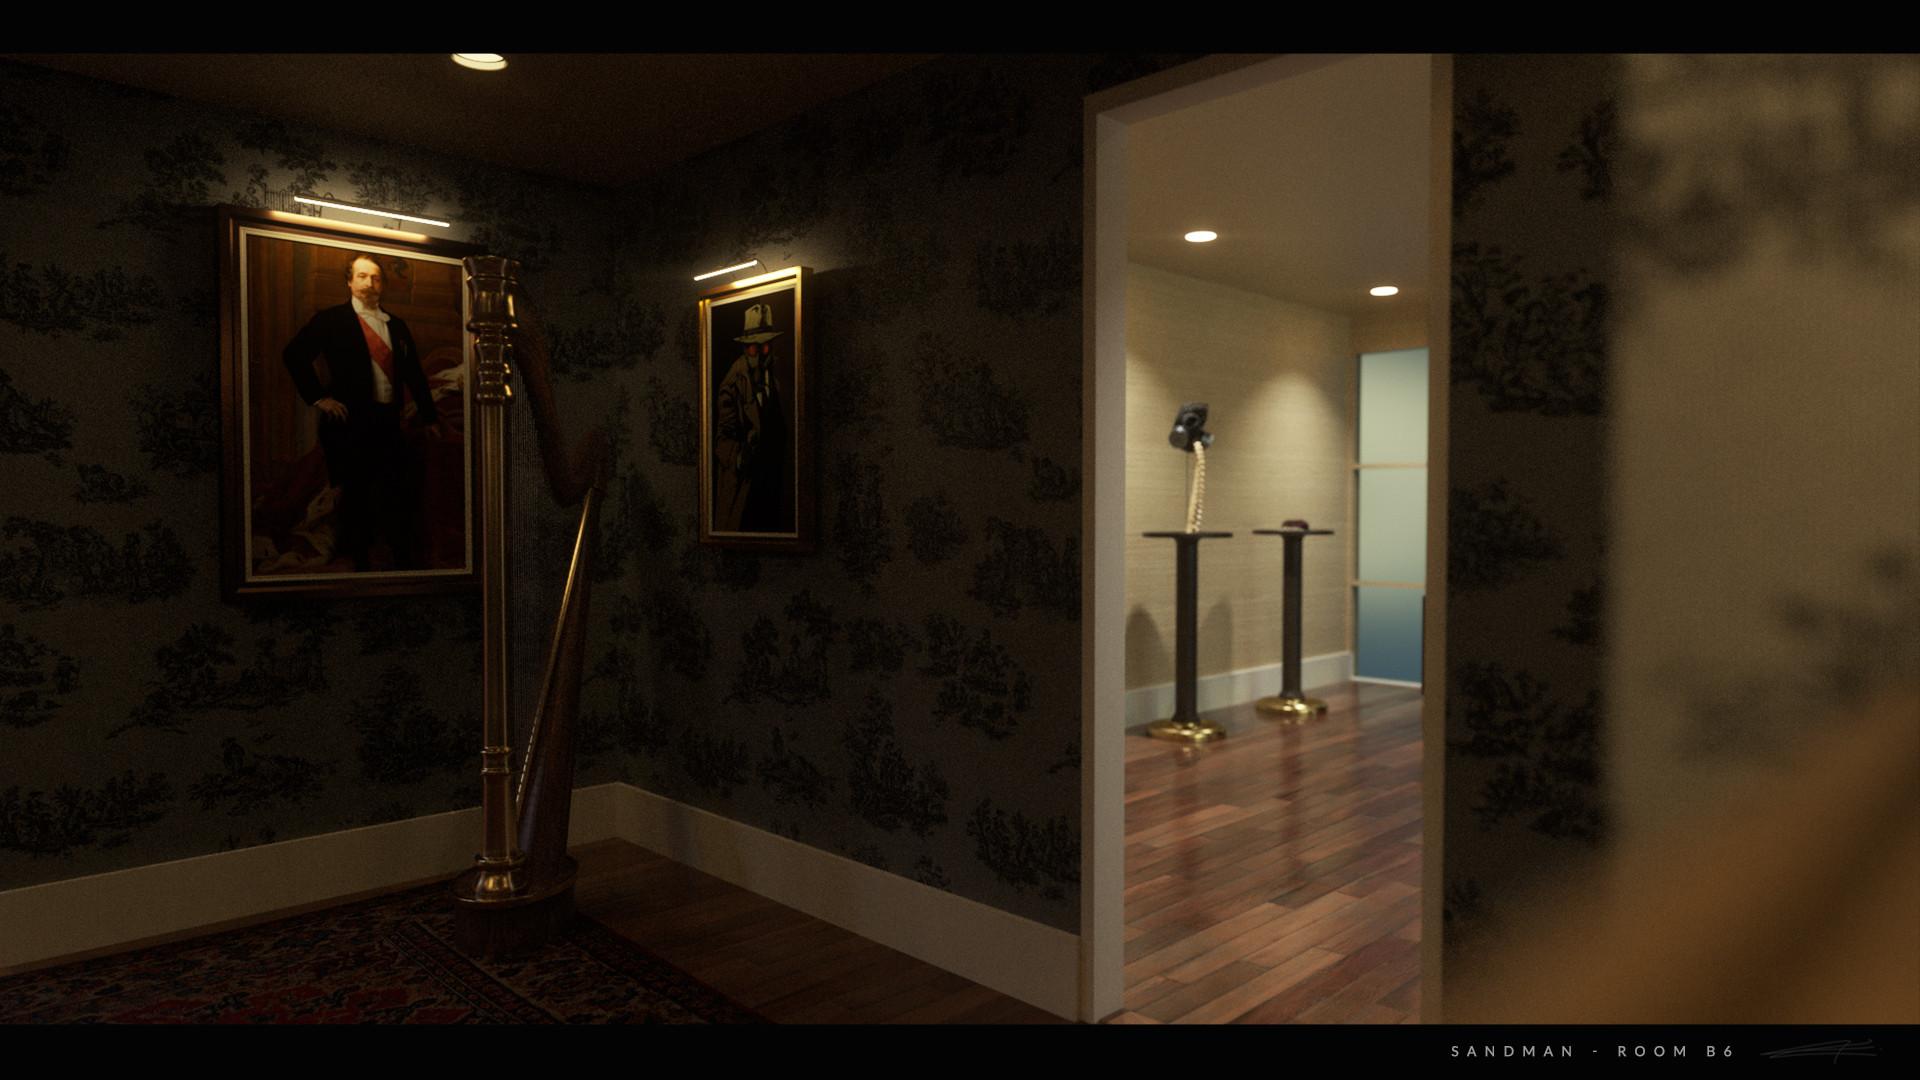 SM_Set_Room_B6_v1.jpg